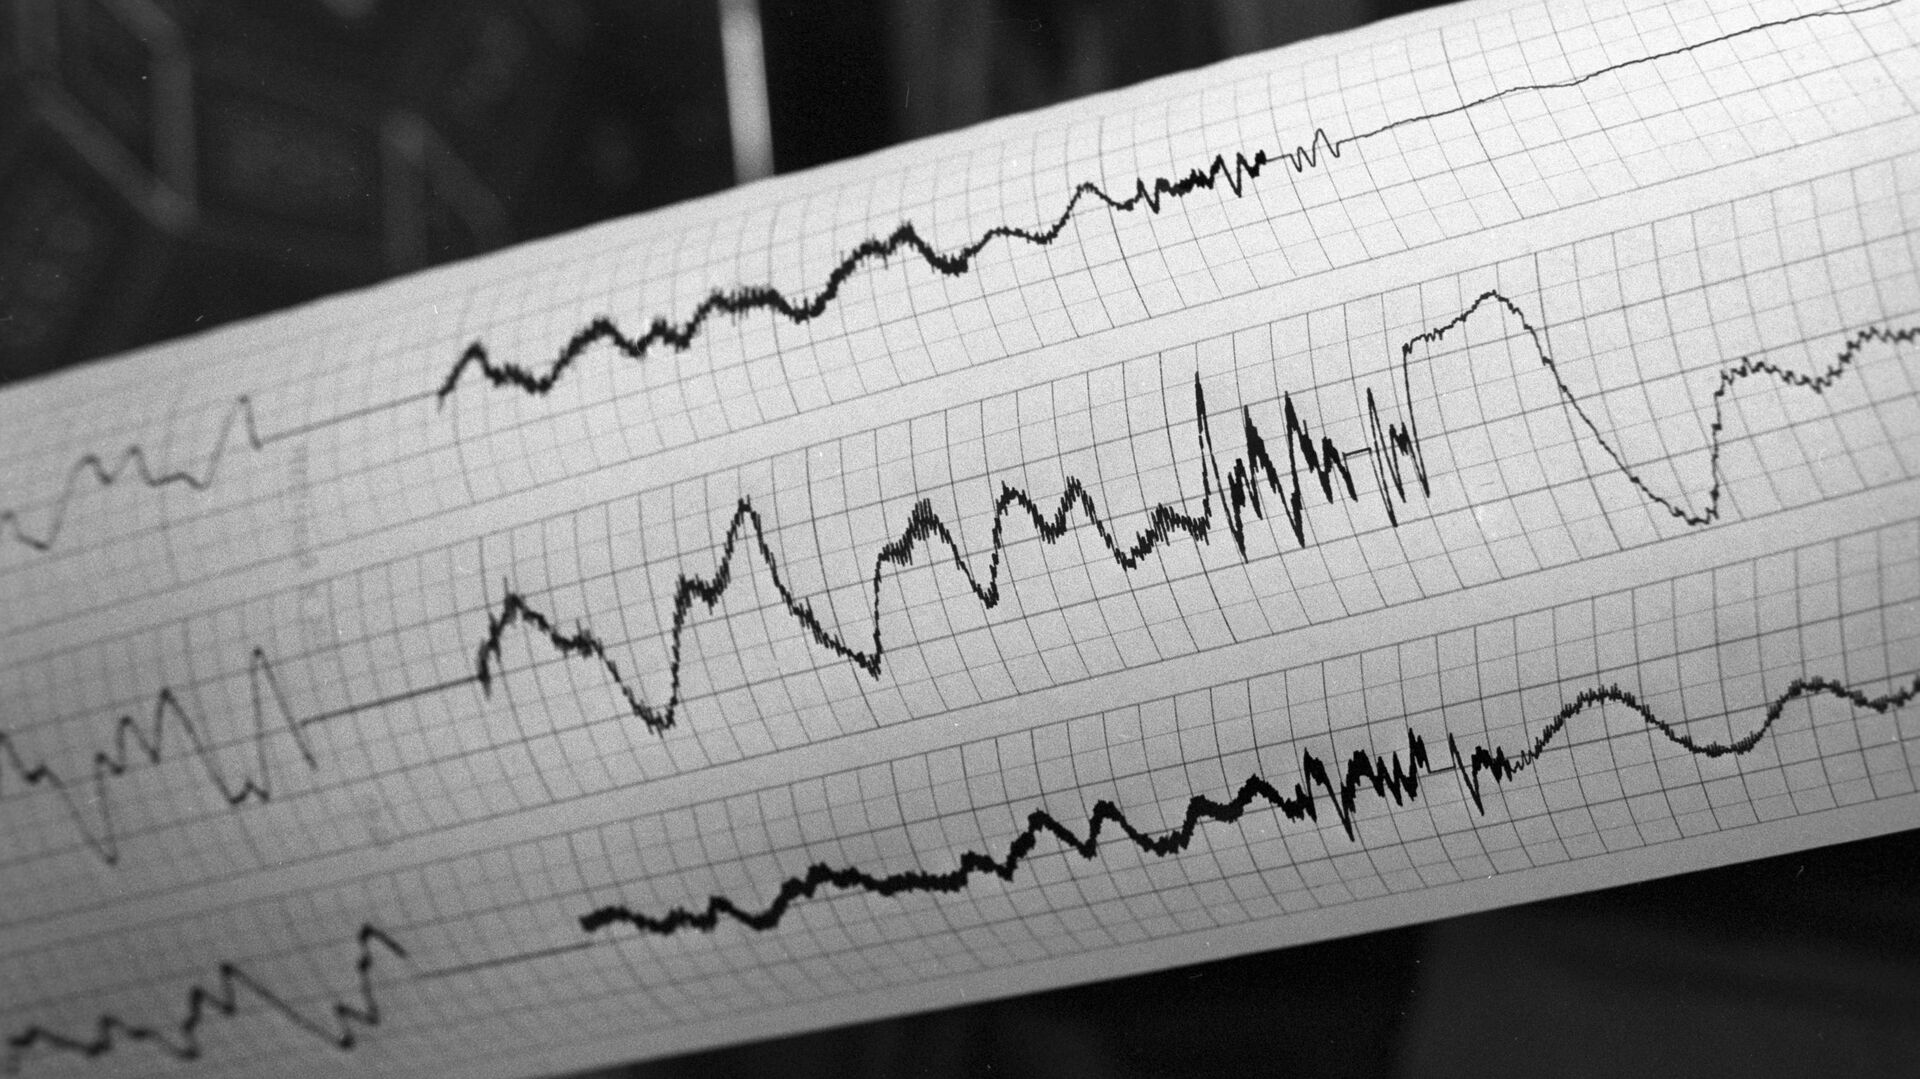 Sismografo di terremoto - Sputnik Italia, 1920, 07.07.2021